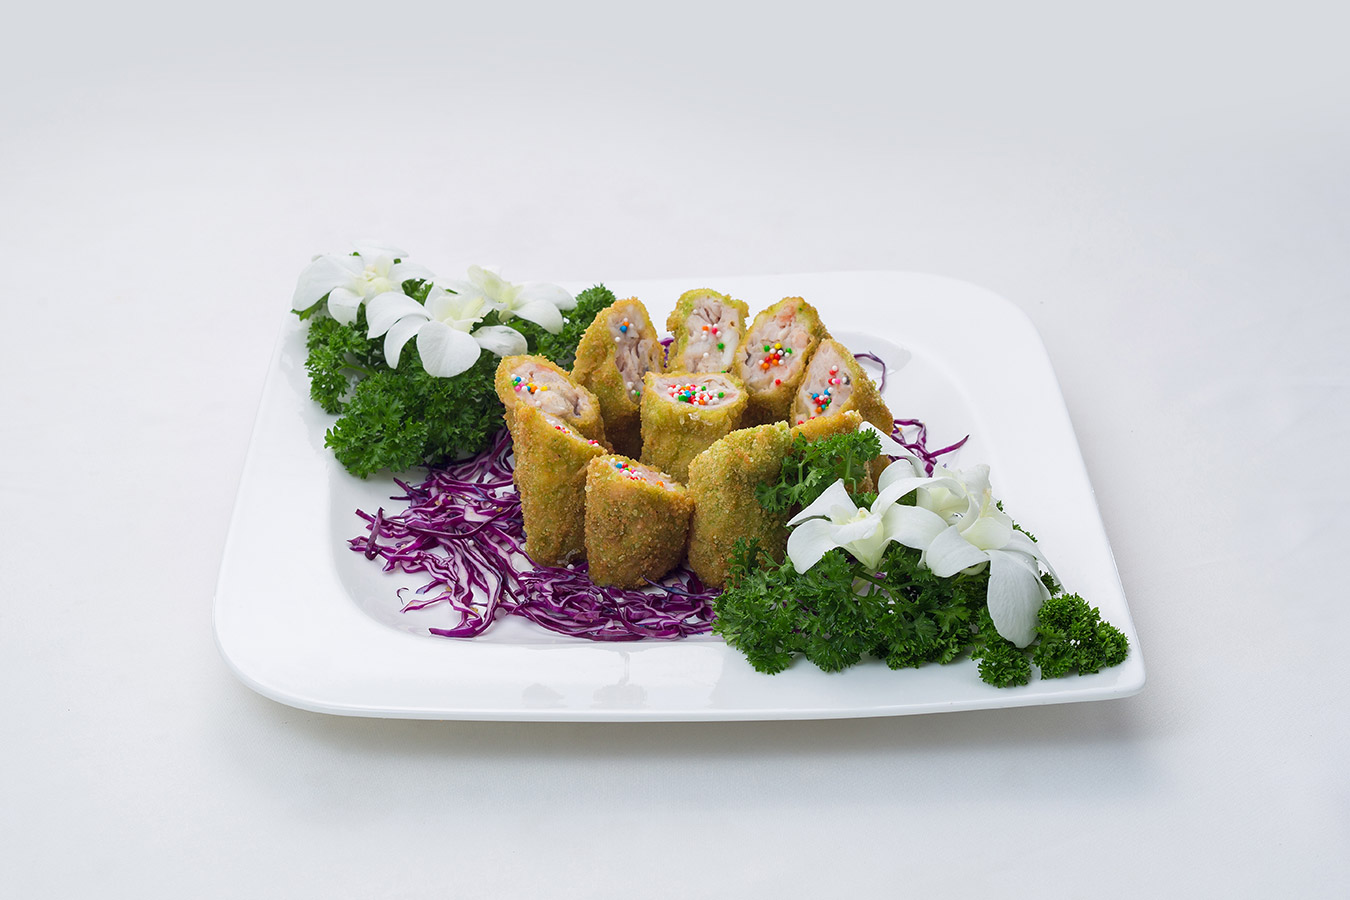 Nhà hàng Cọ Dầu